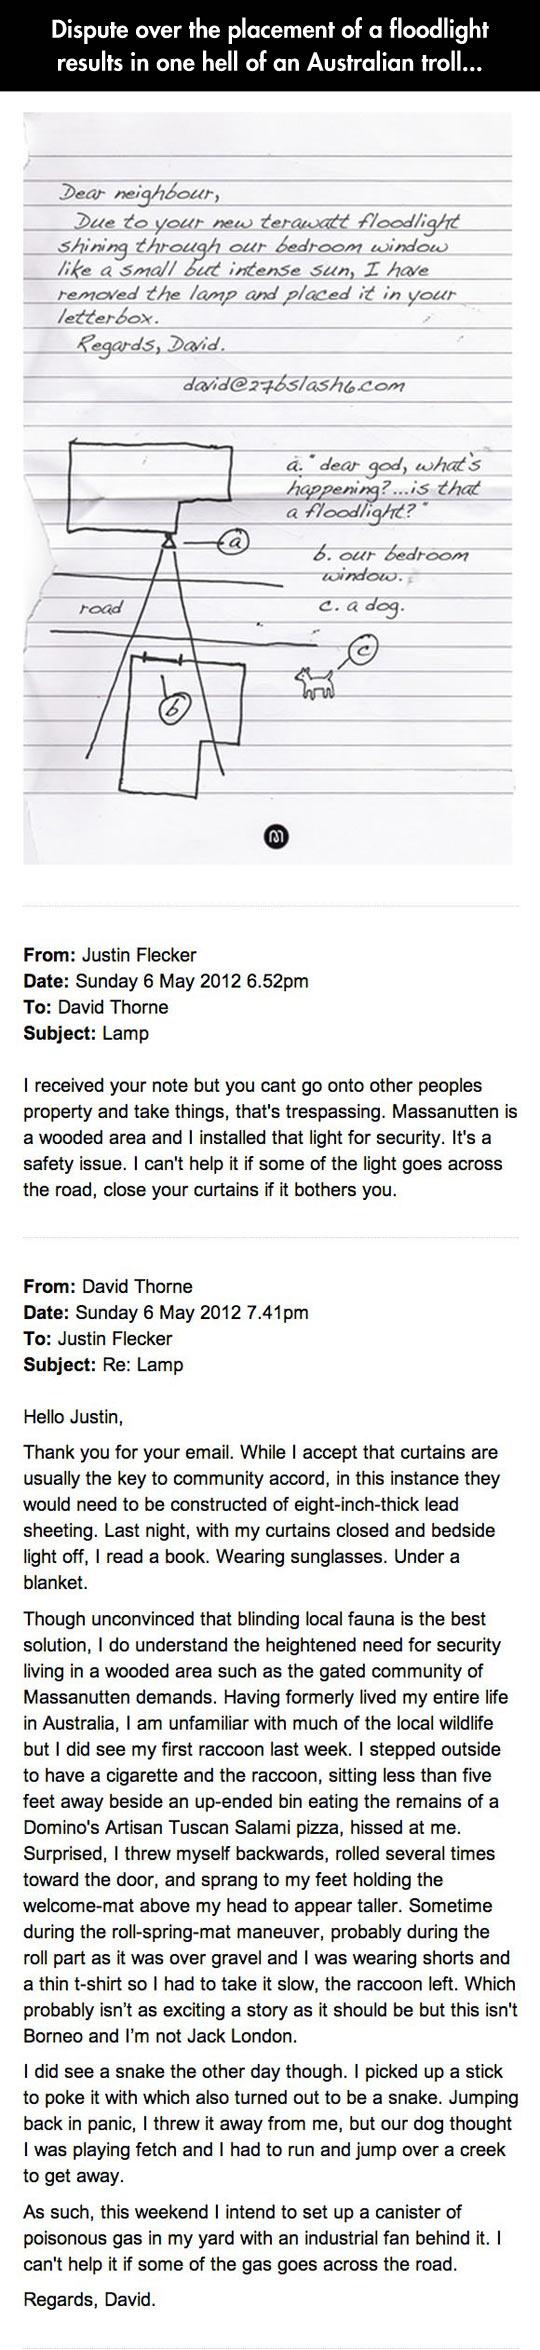 funny-Australian-troll-floodlight-email-neighbour